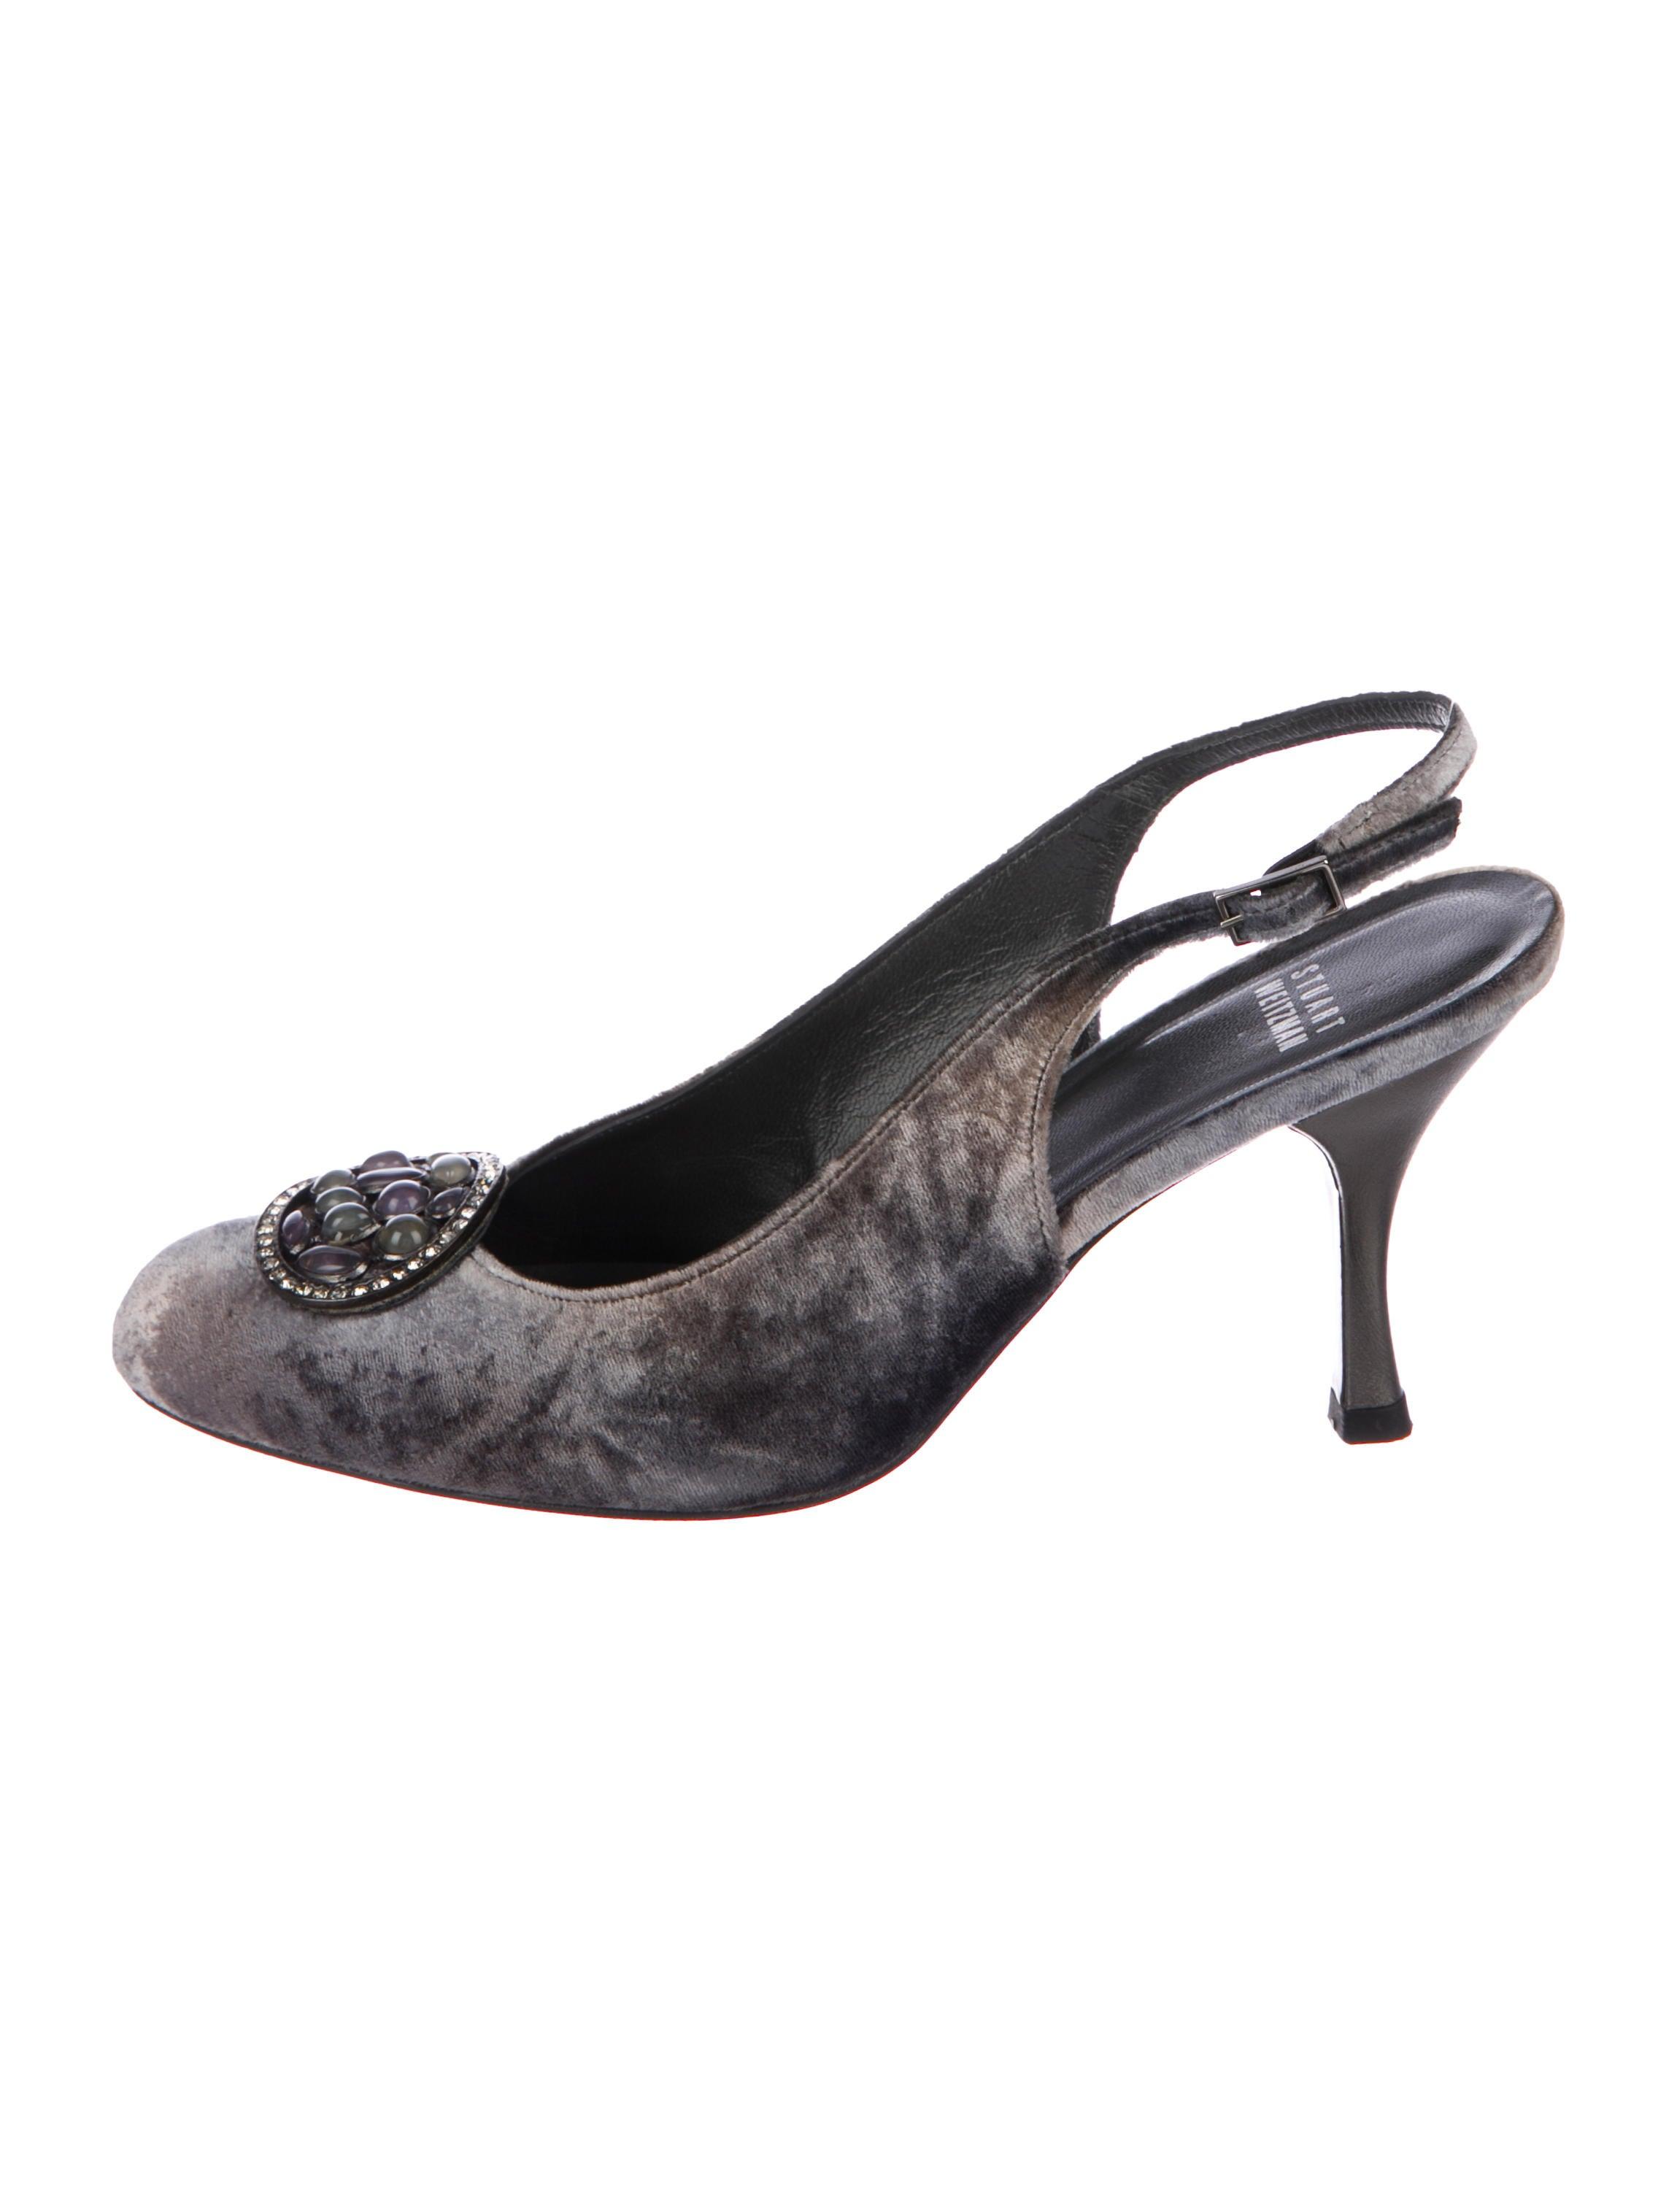 Stuart Weitzman Velvet Embellished Pumps Shoes Wsu52089 The